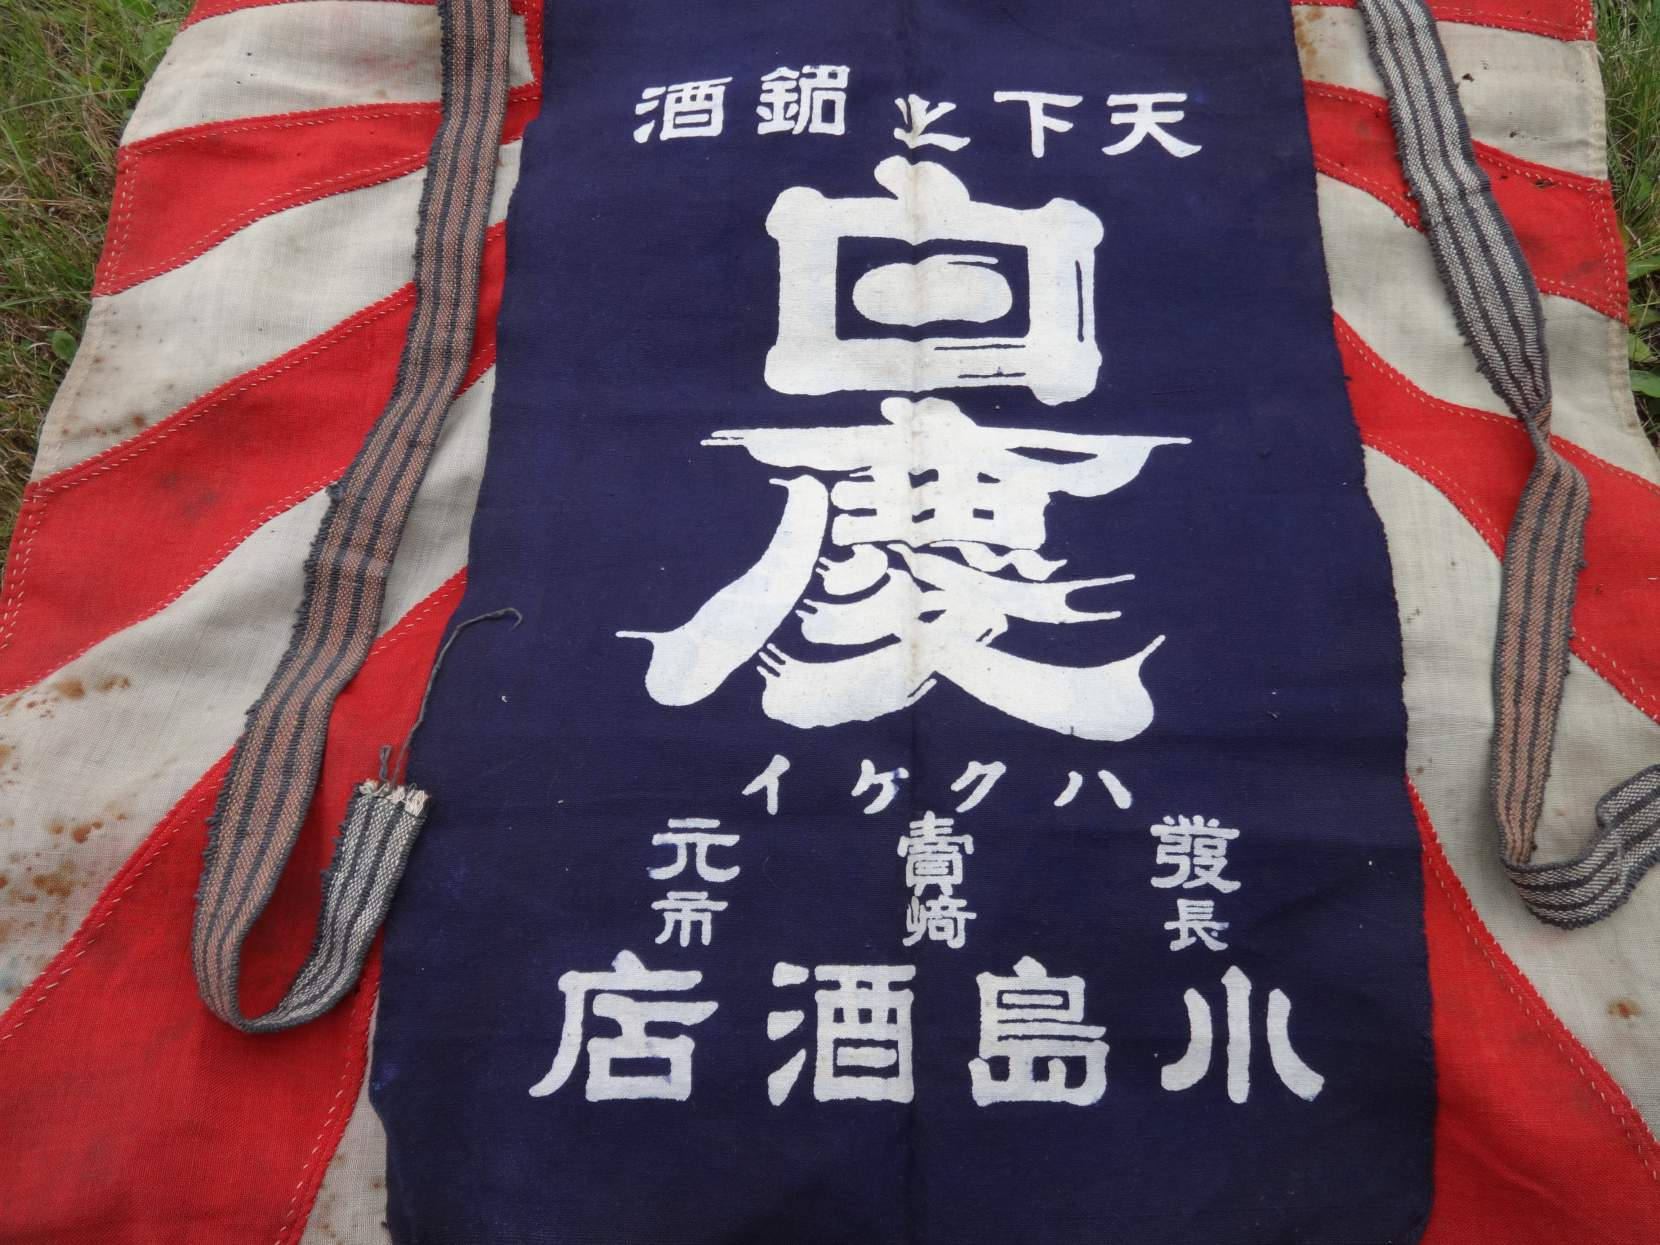 Need help kanji on banner